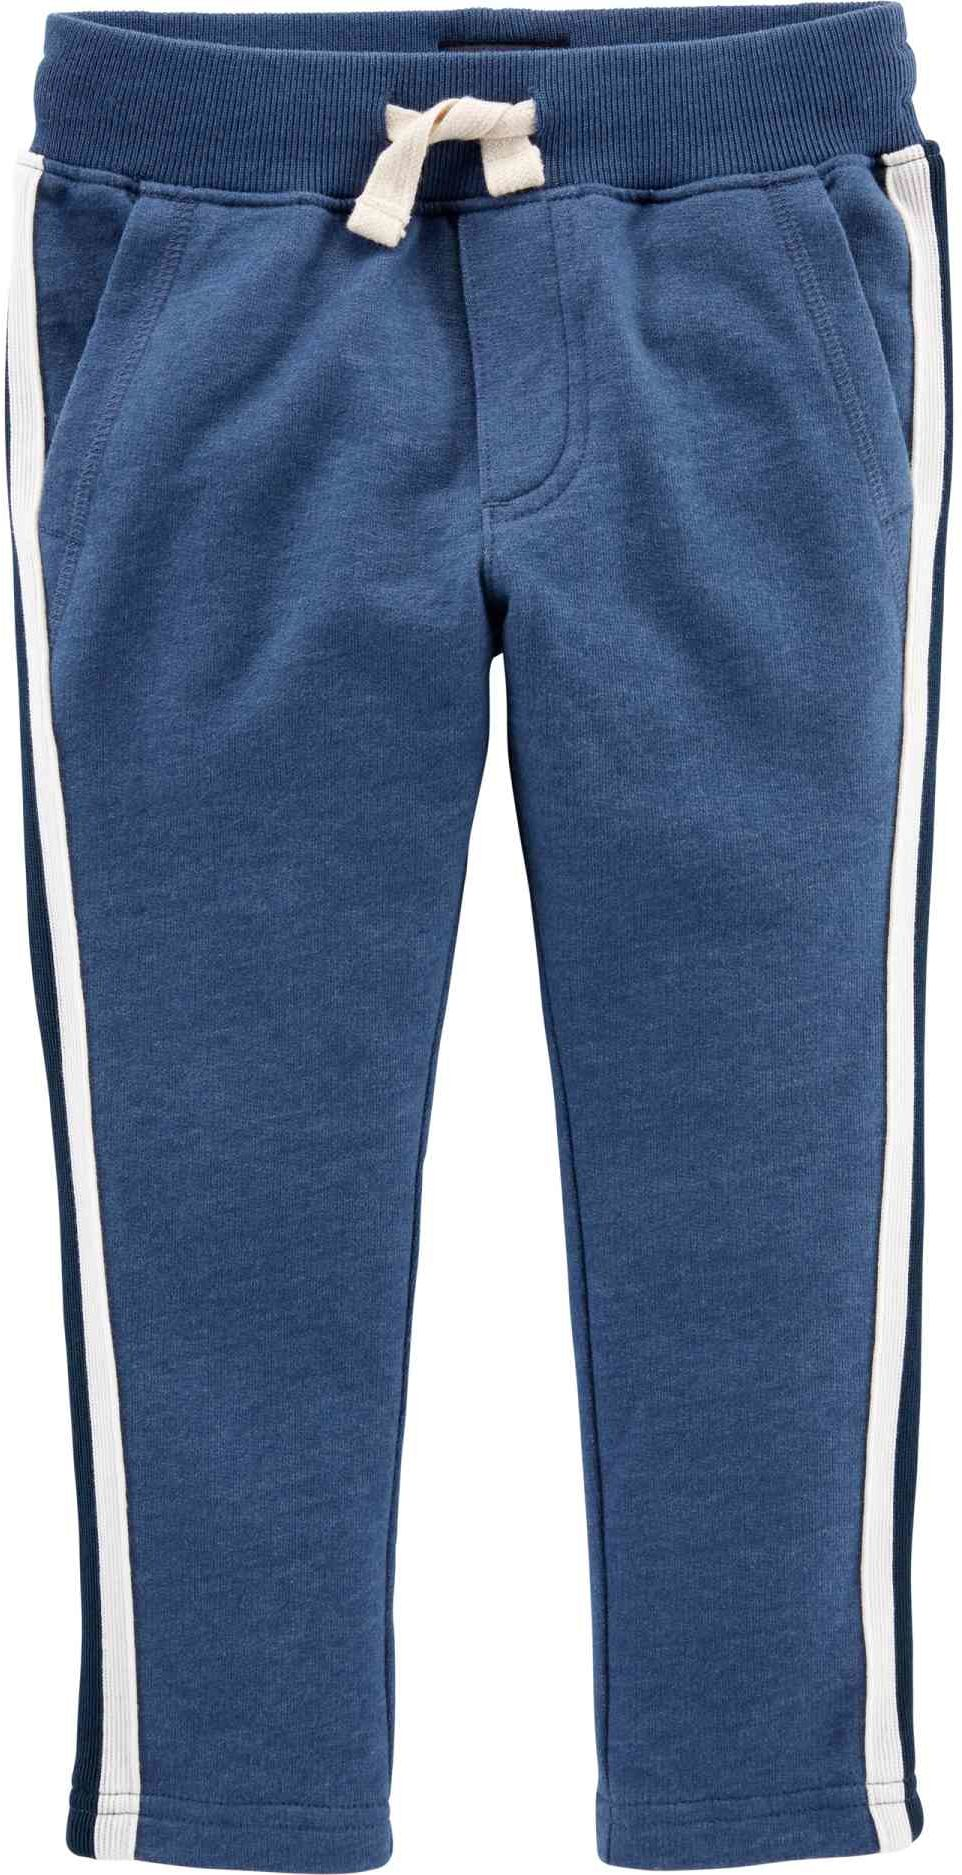 Carter''s - Spodnie joggersy lampasy blue - 68 cm